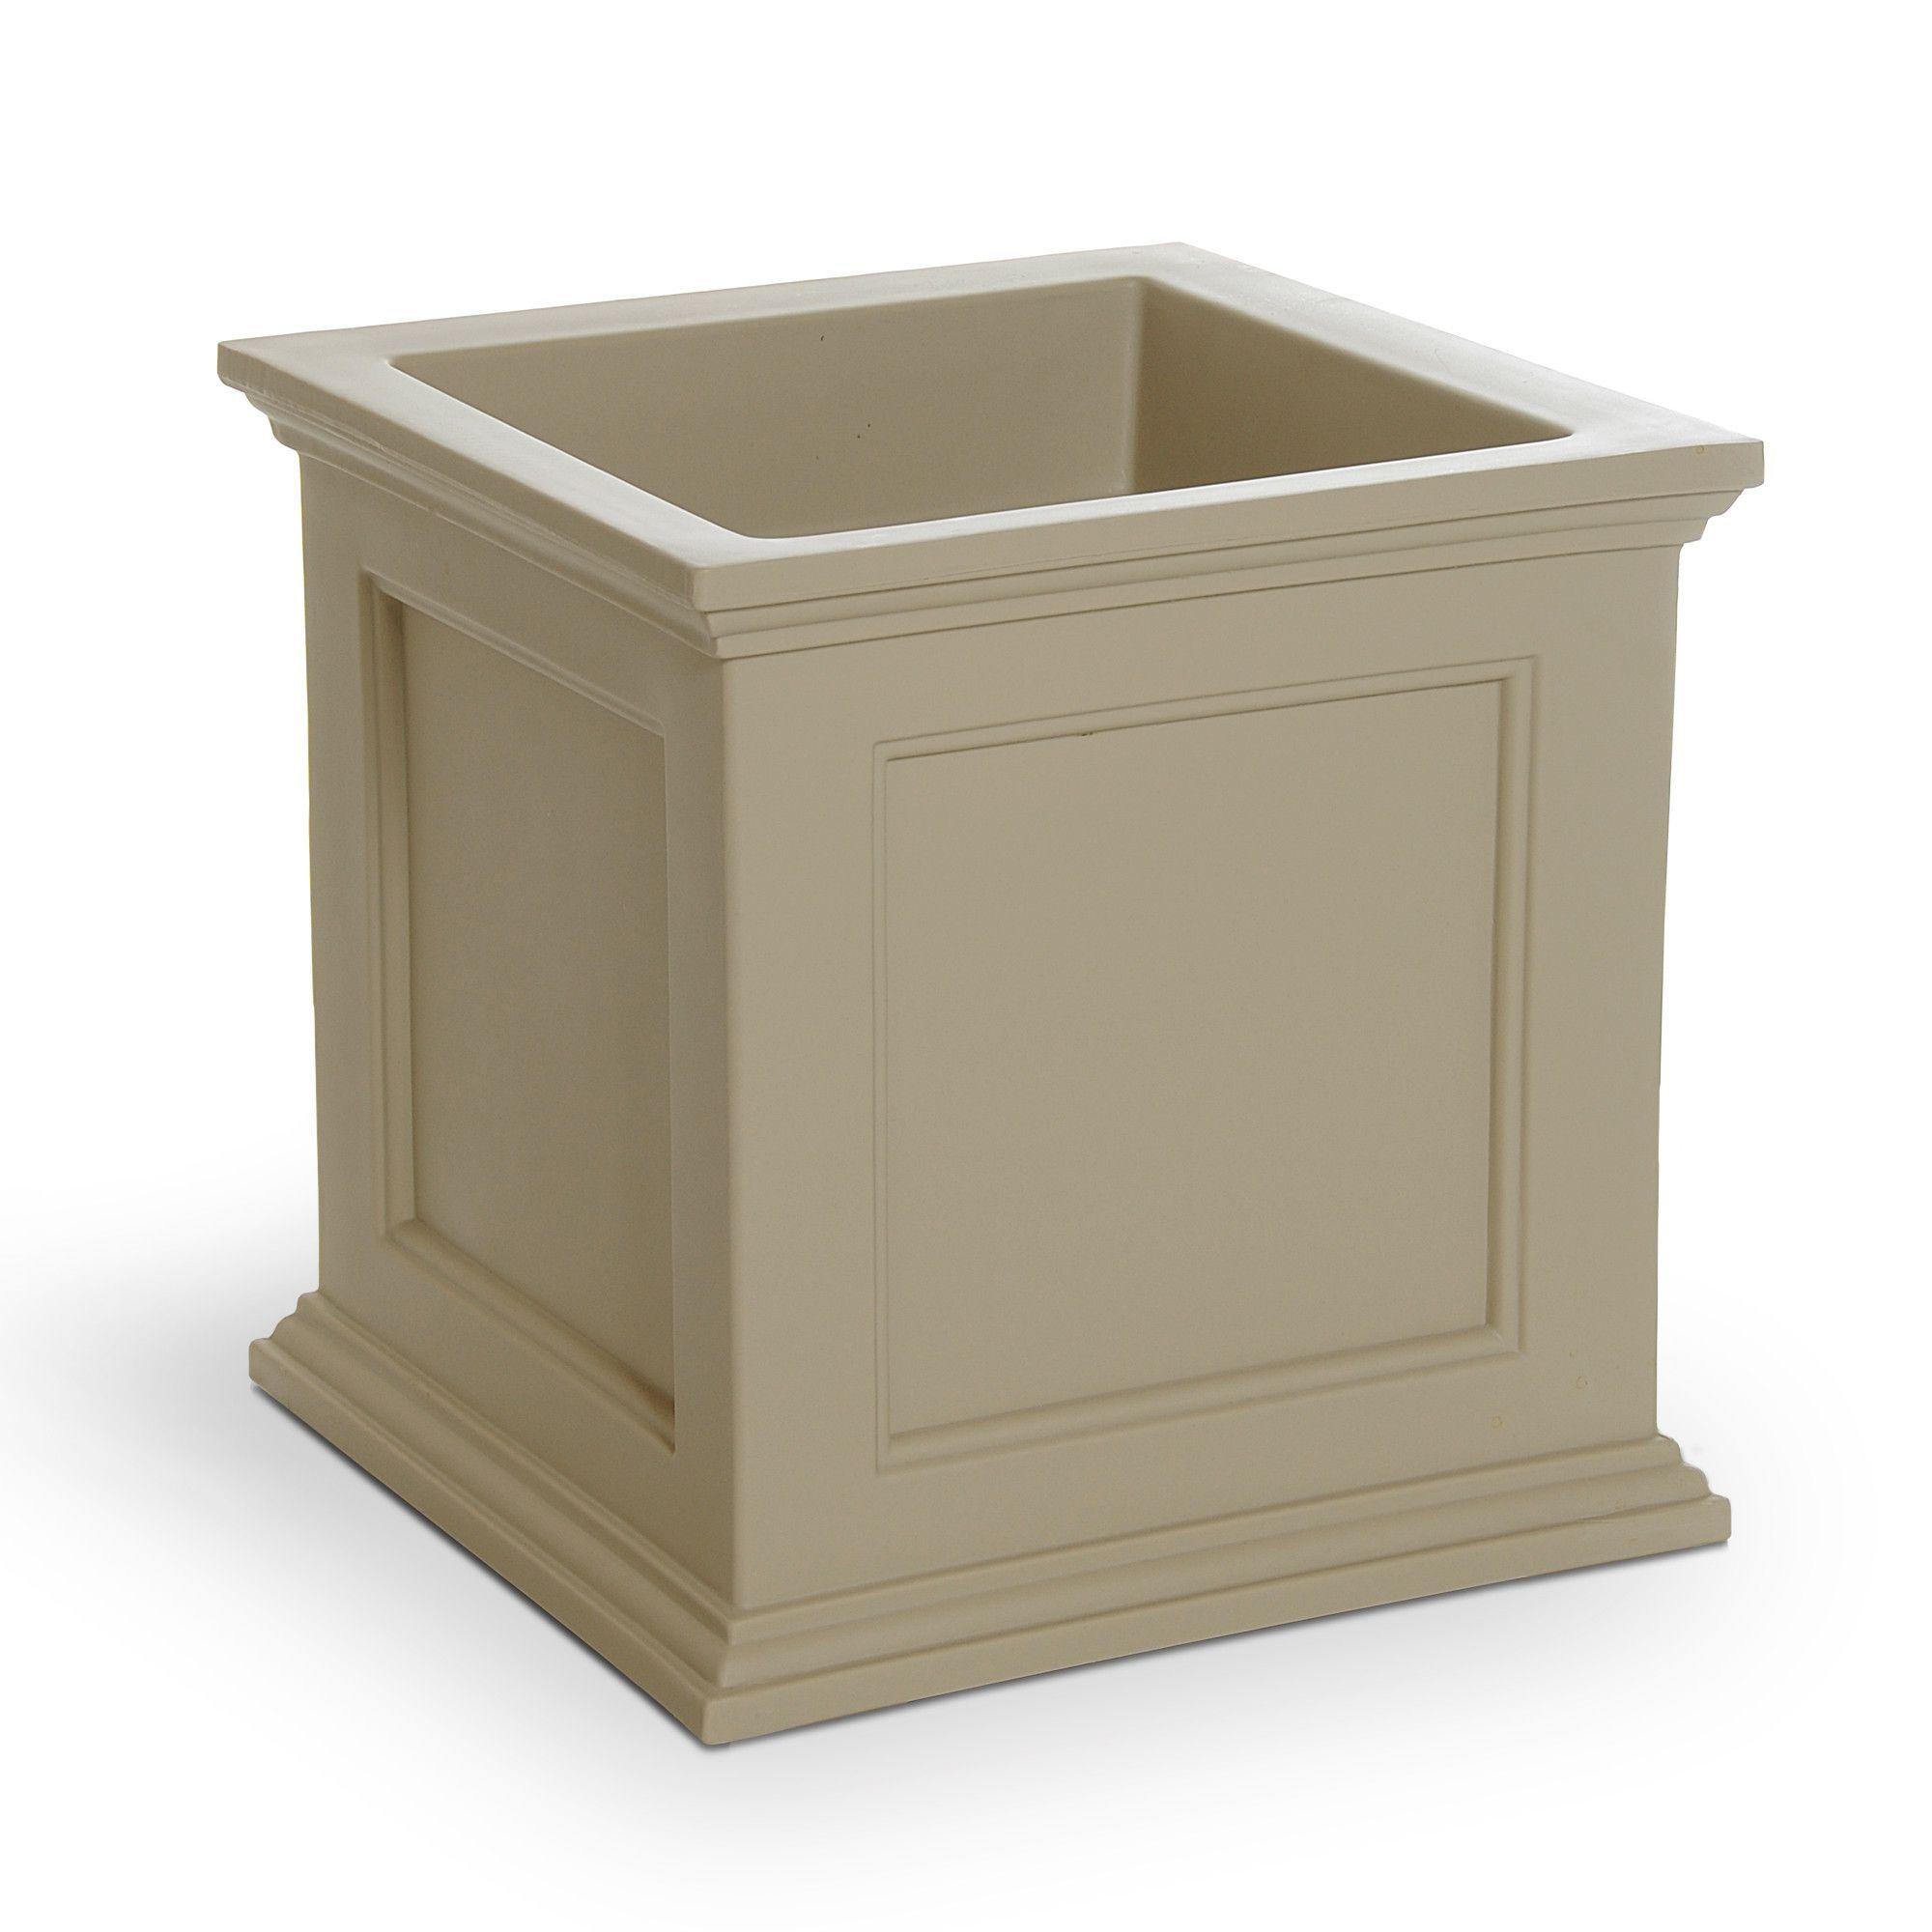 Fairfield Square Planter Box